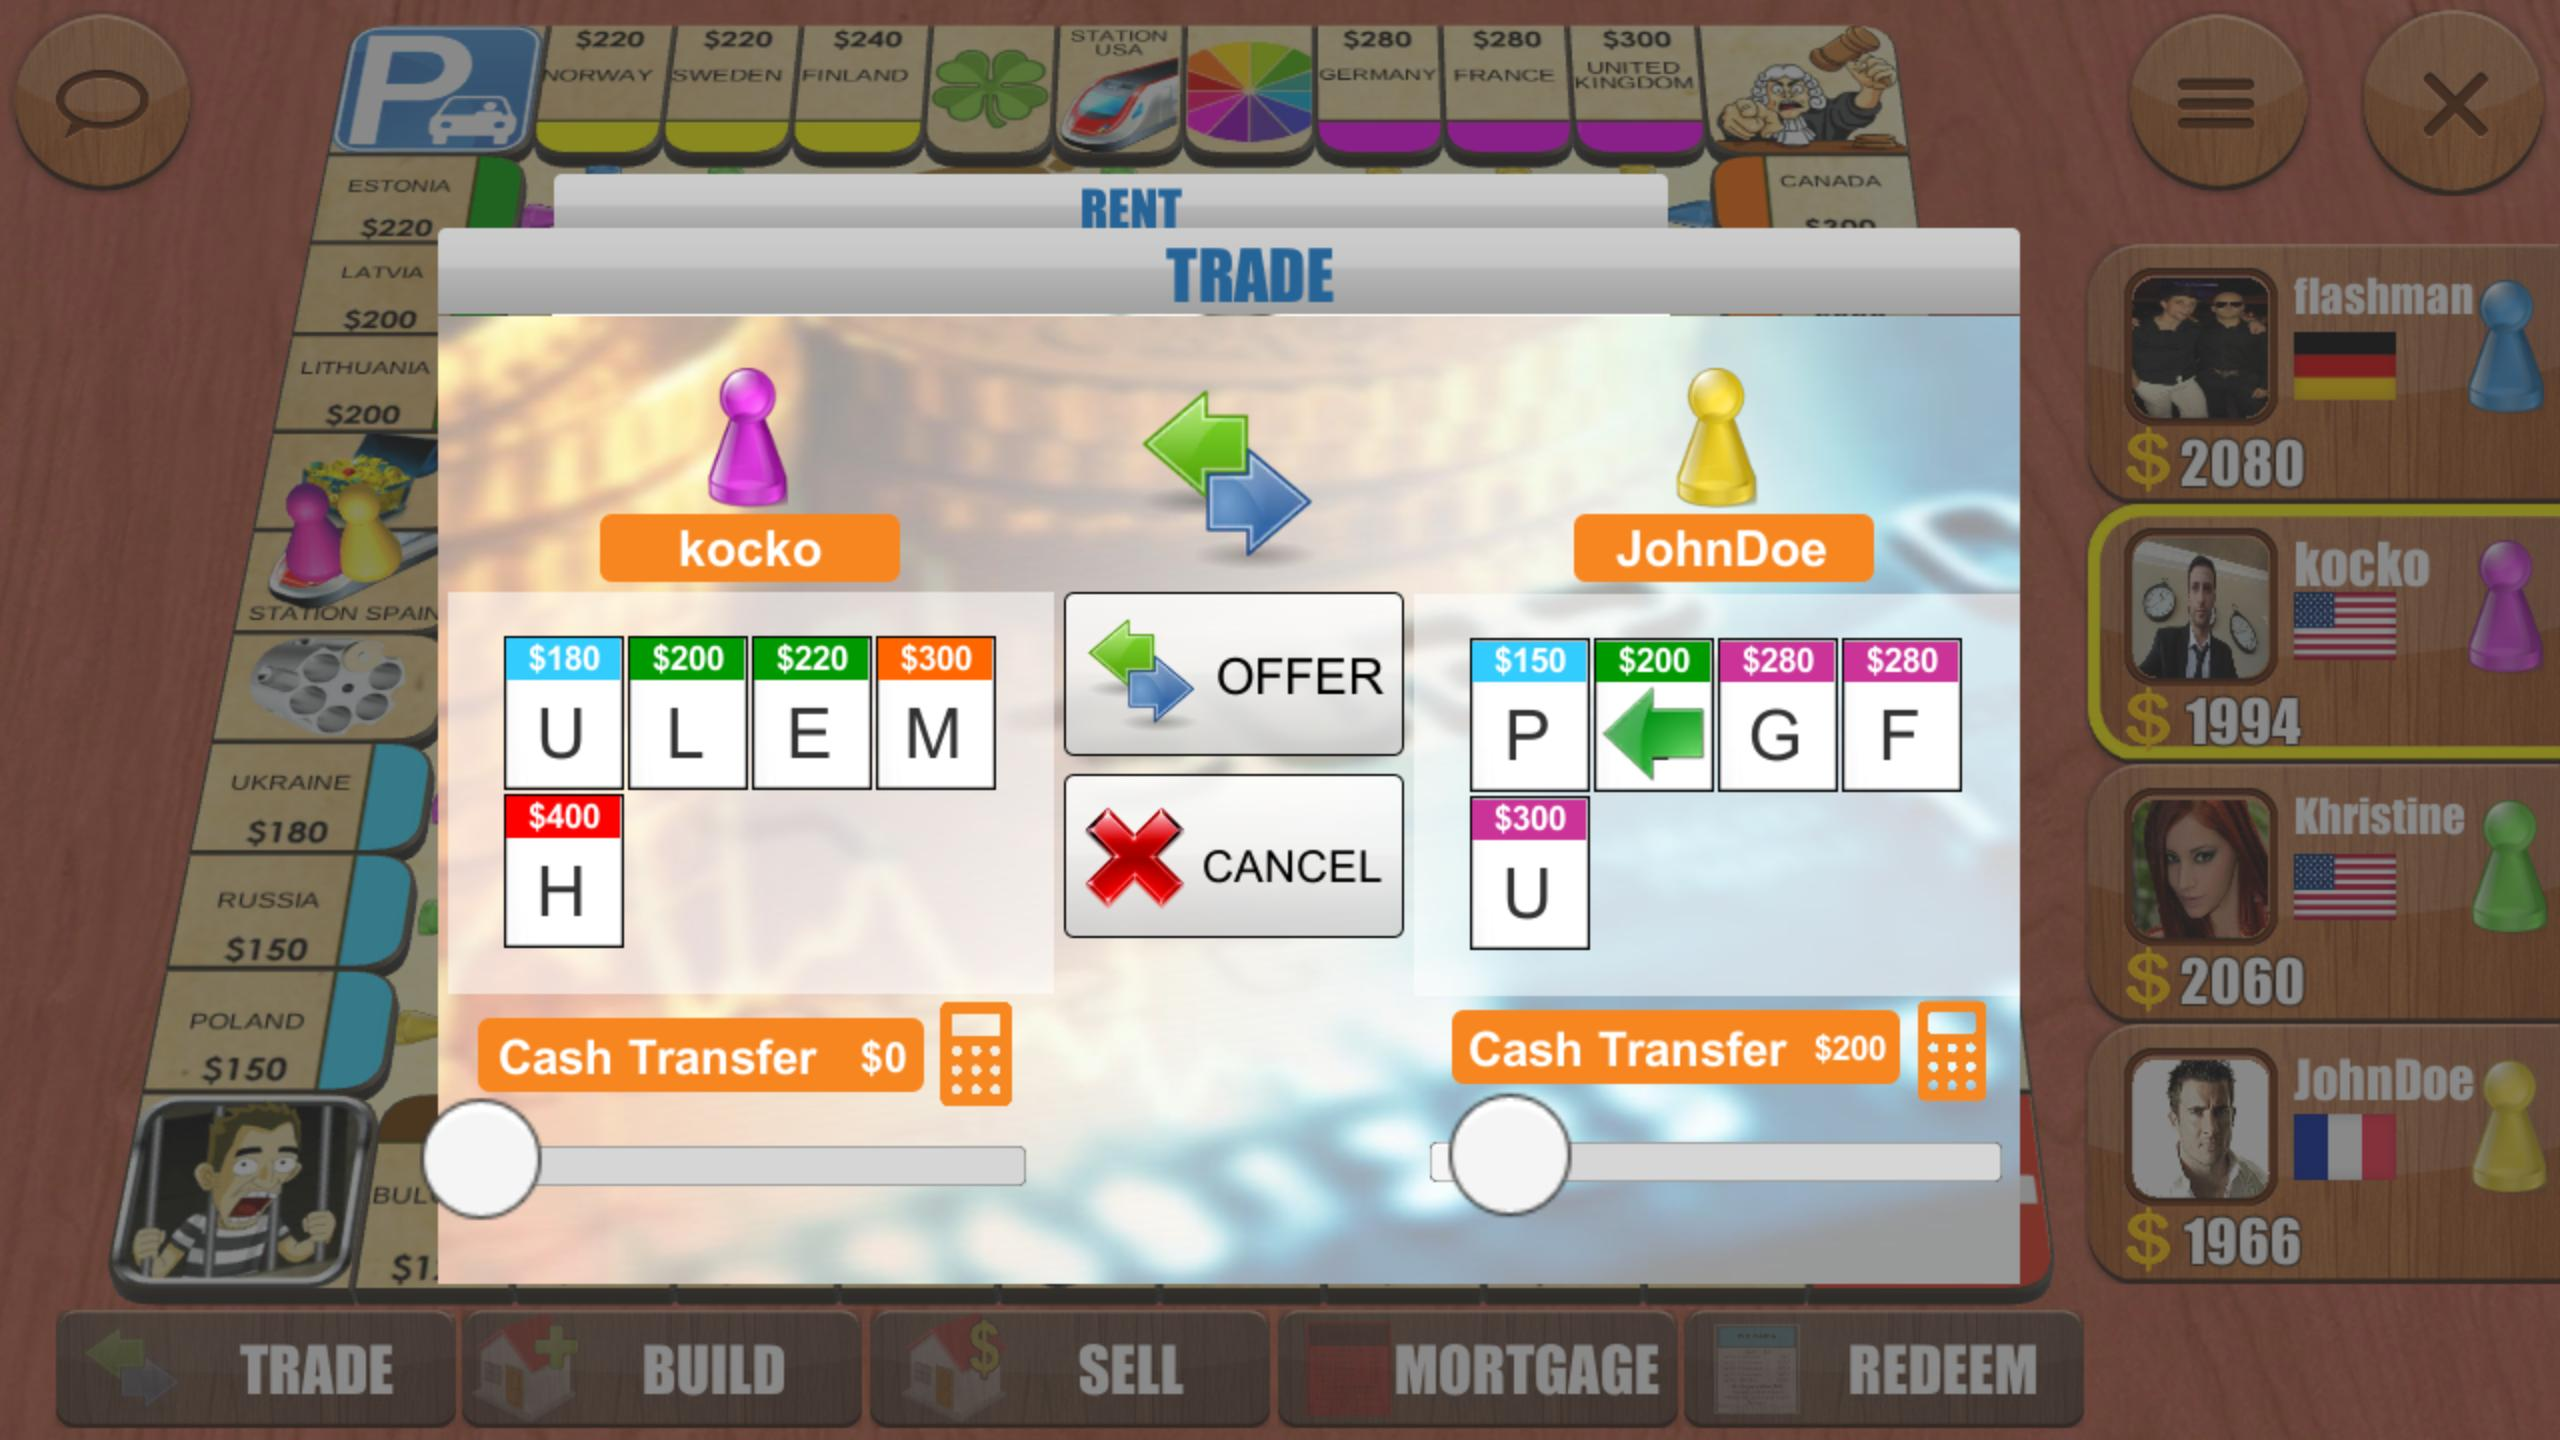 Rento Dice Board Game Online 5.1.9 Screenshot 3